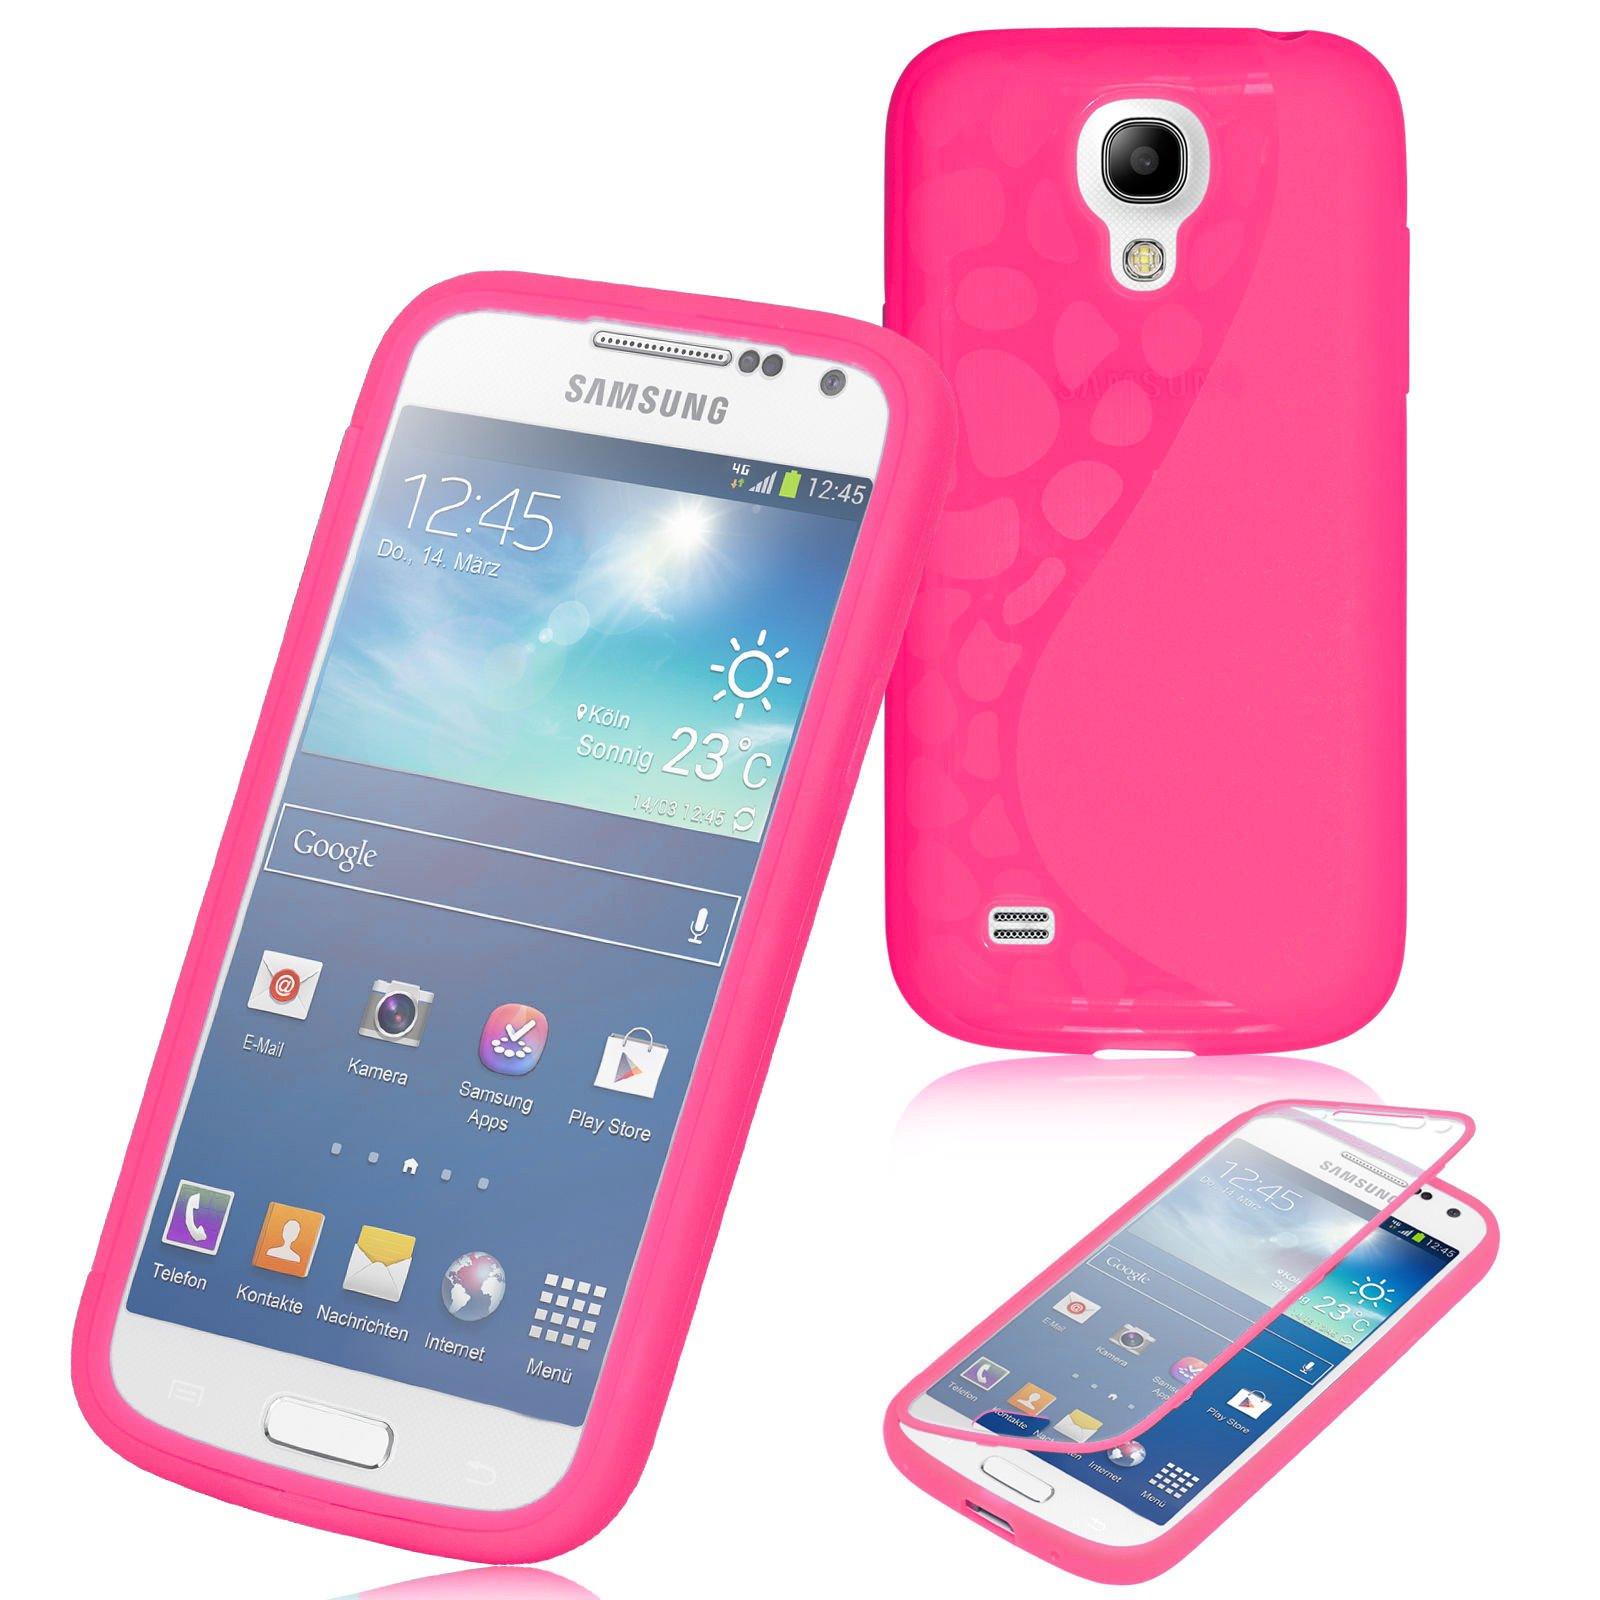 Samsung Galaxy S4 Mini Case, JAMMYLIZARD Funda De Silicona TPU [Silicone Flip] Con Tapa Flip Cover, FUCSIA: Amazon.es: Electrónica